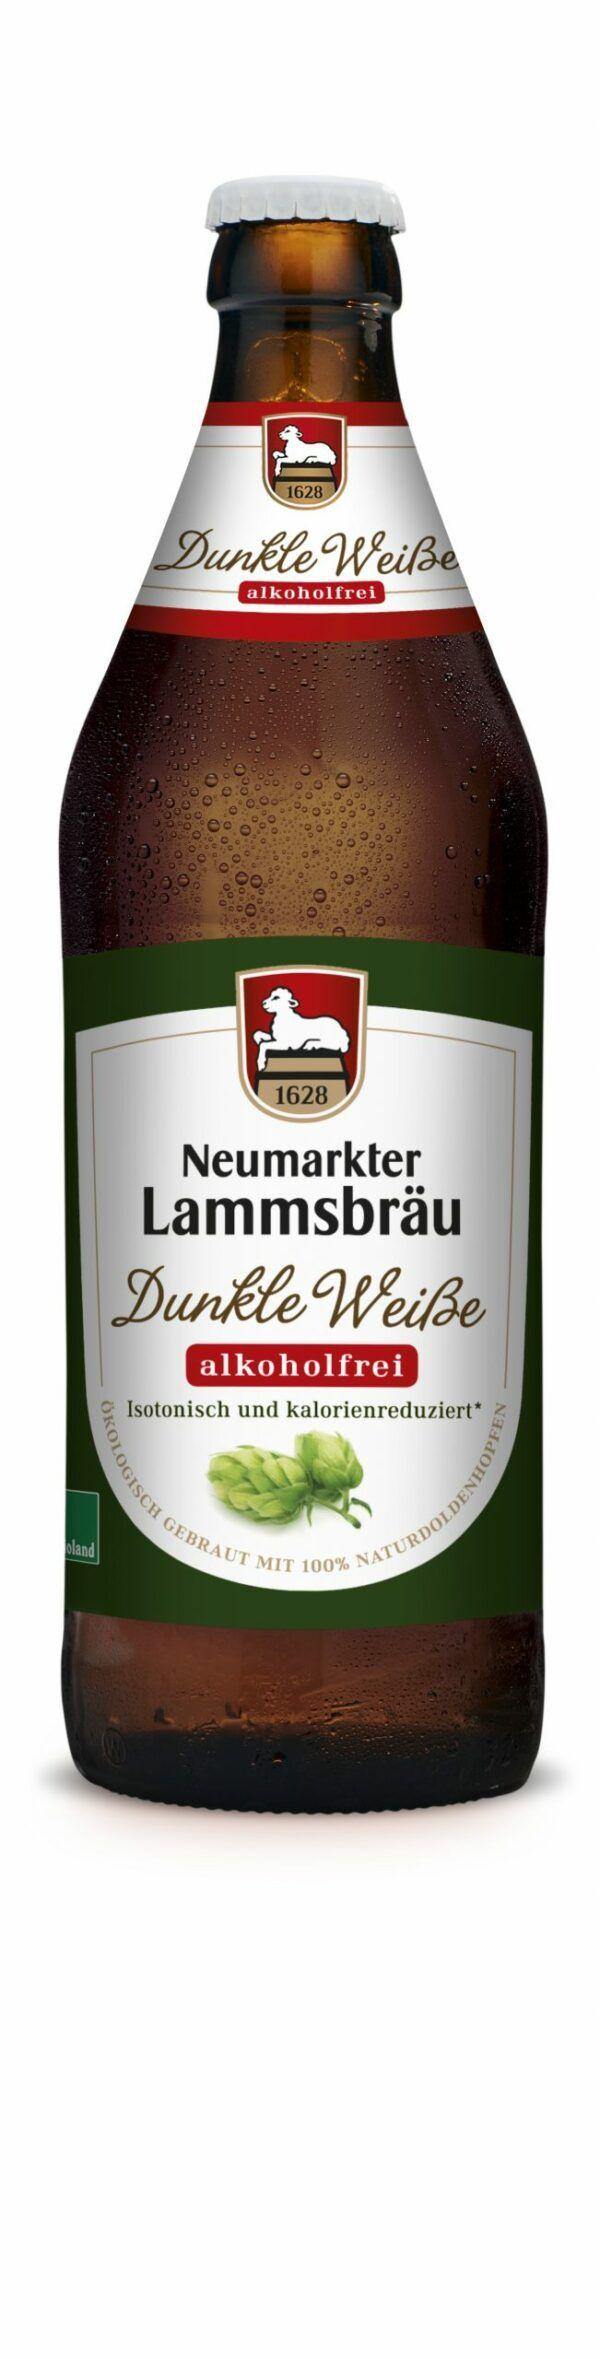 Neumarkter Lammsbräu Lammsbräu Dunkle Weiße alk.frei (Bio) 0,5l